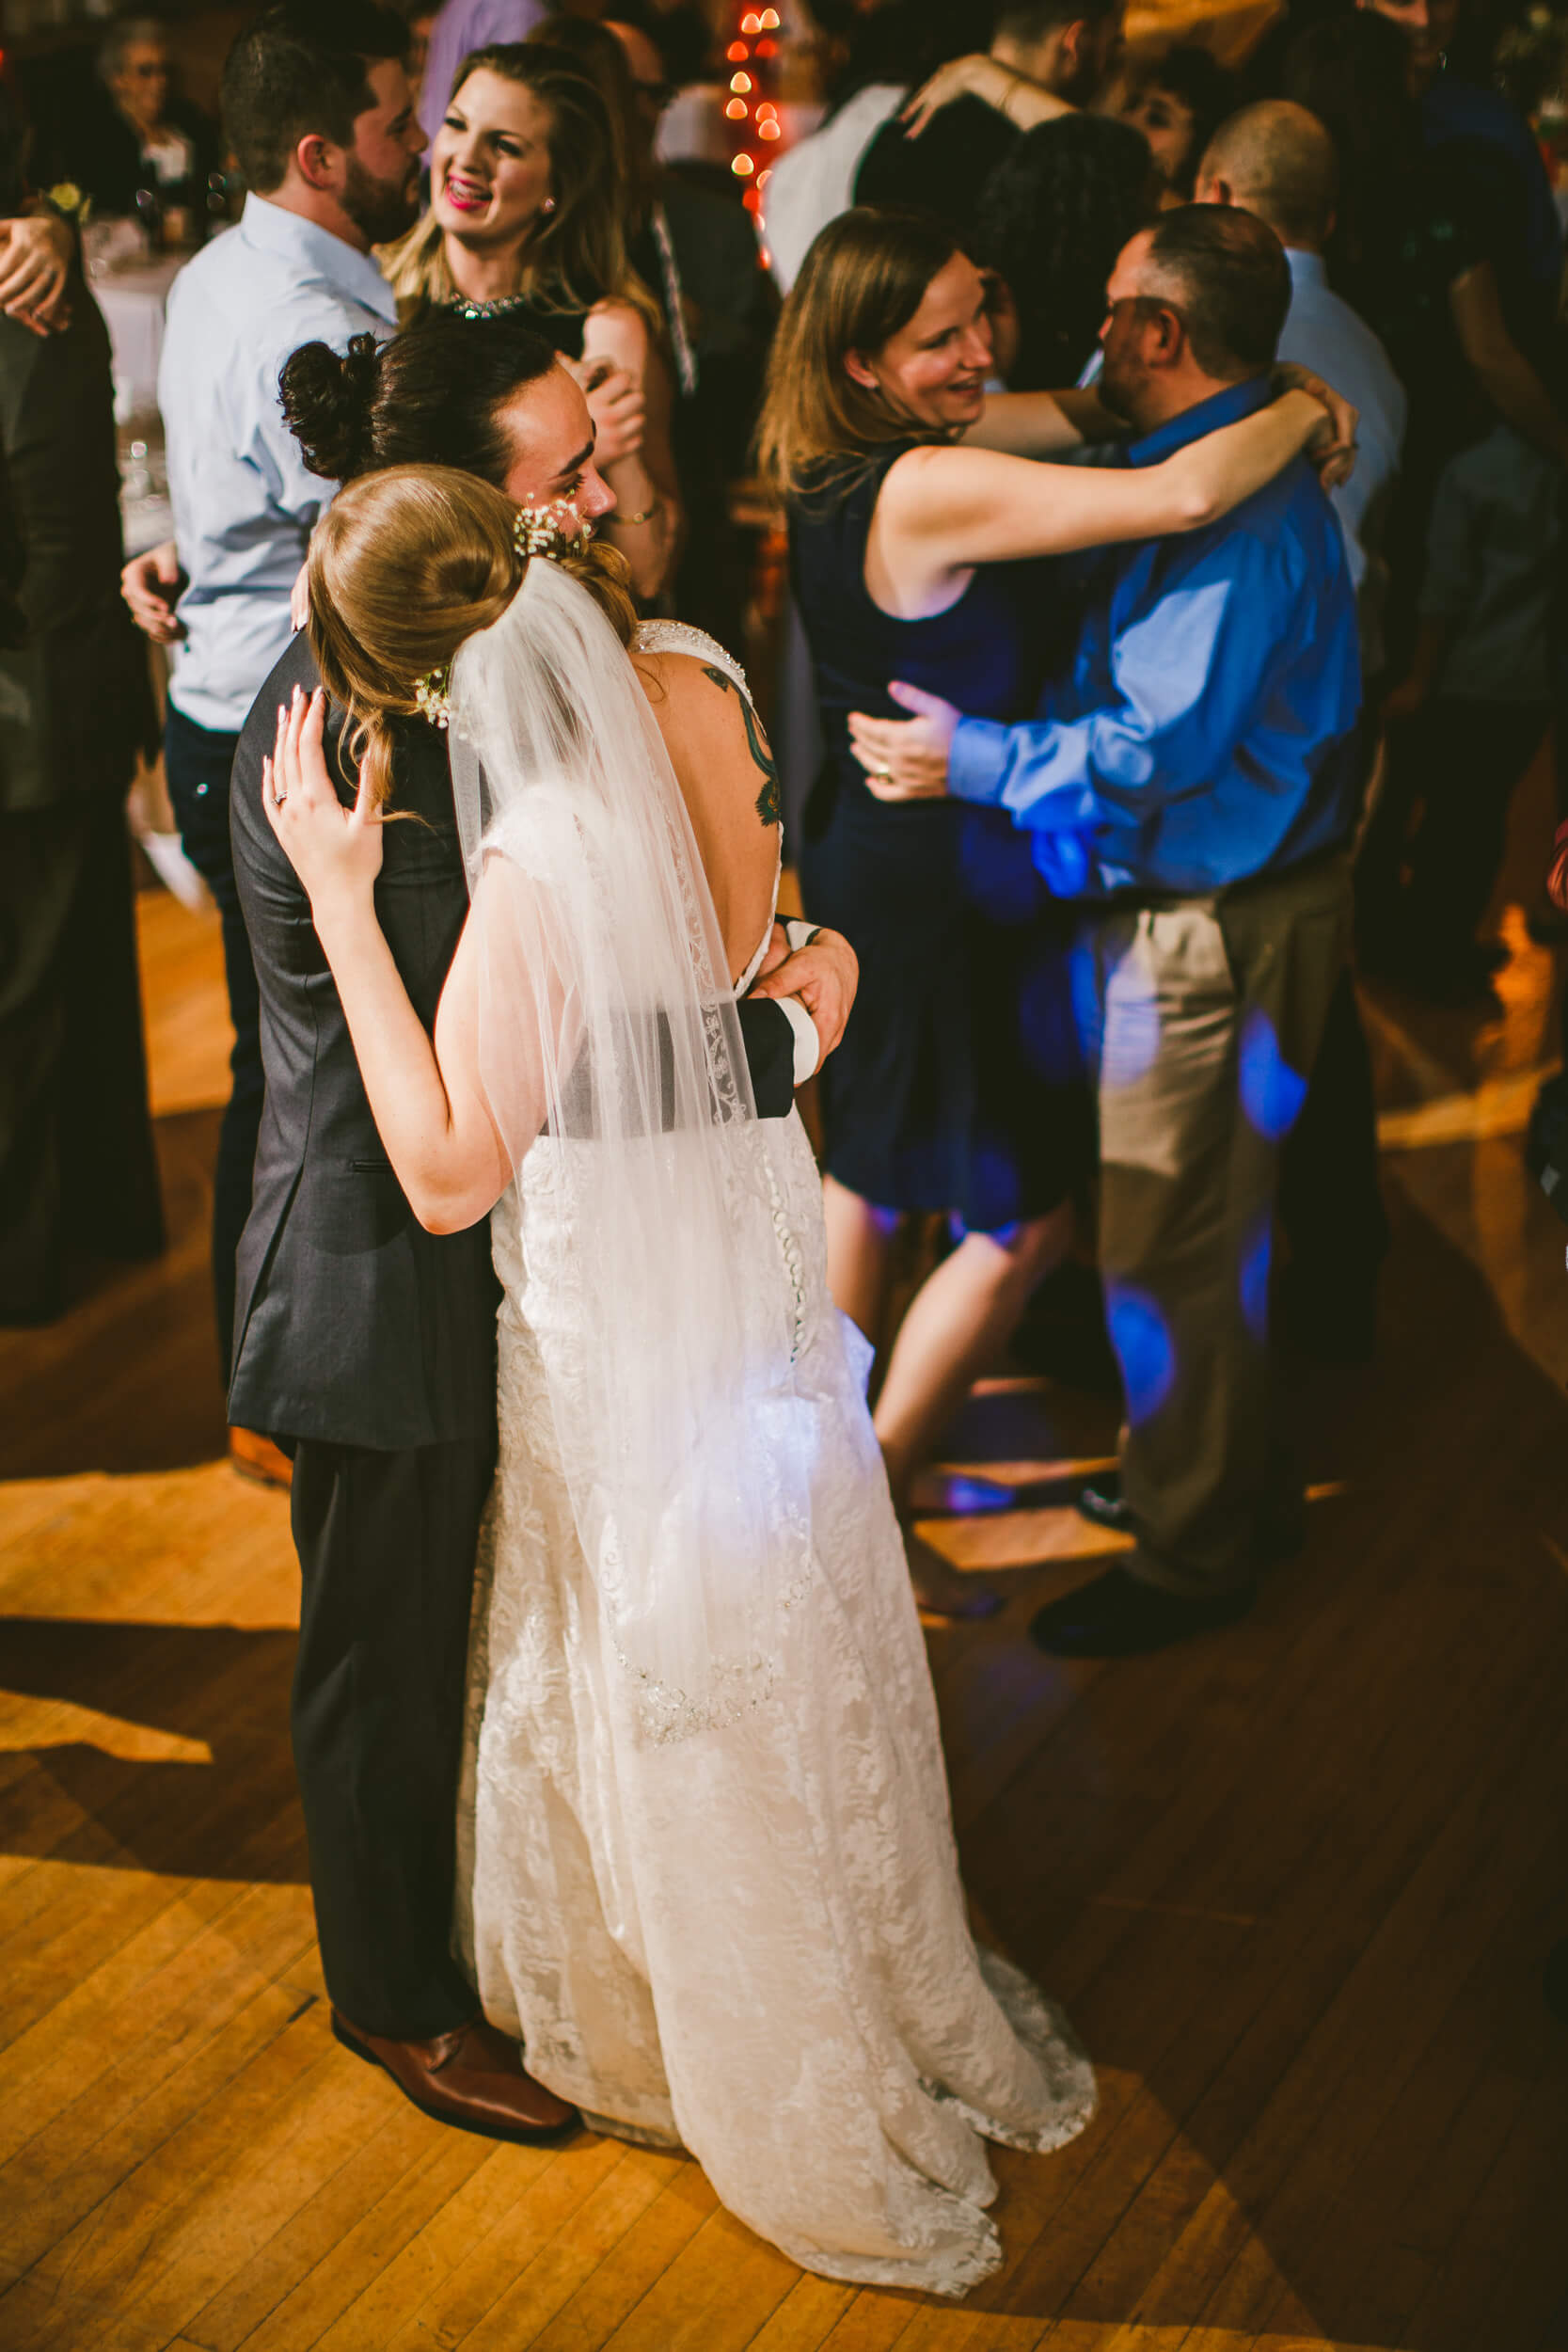 mukogawa winter wedding in spokane (296).jpg